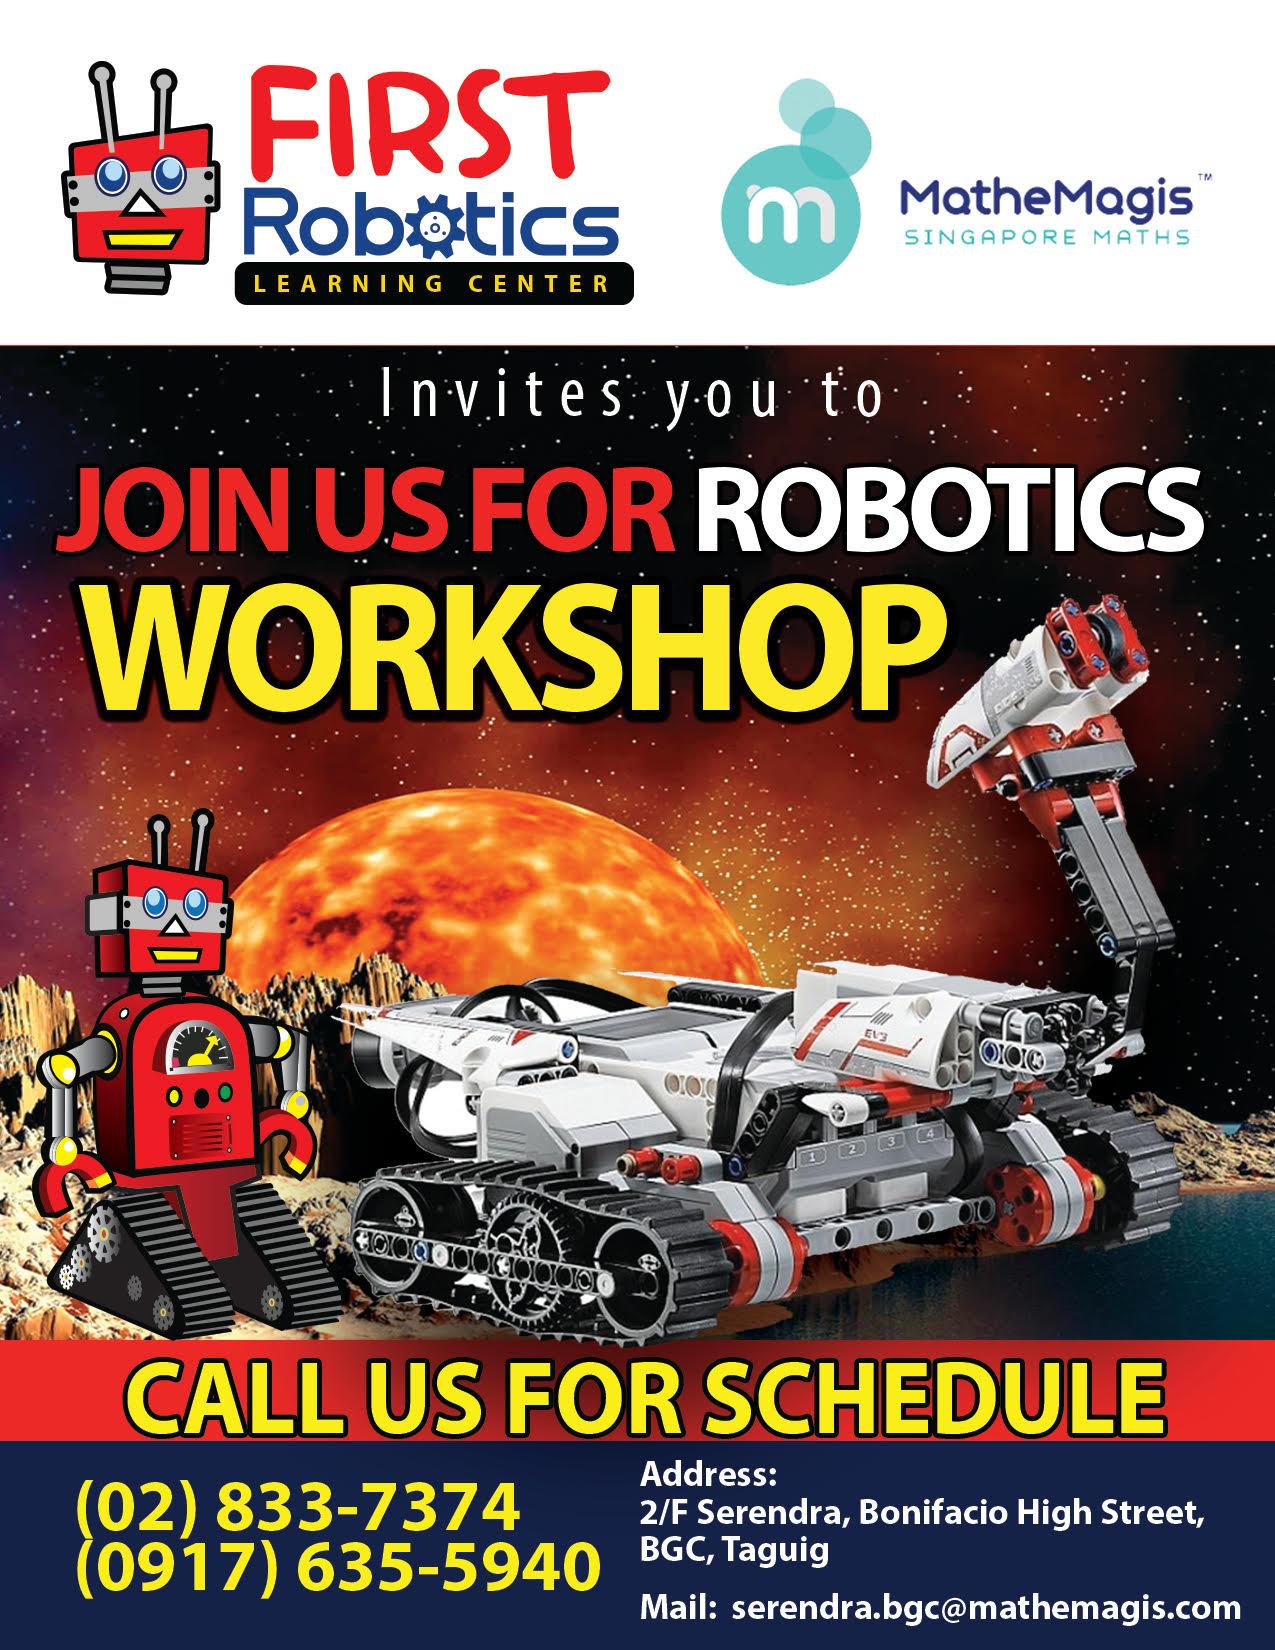 First Robotics Learning Center